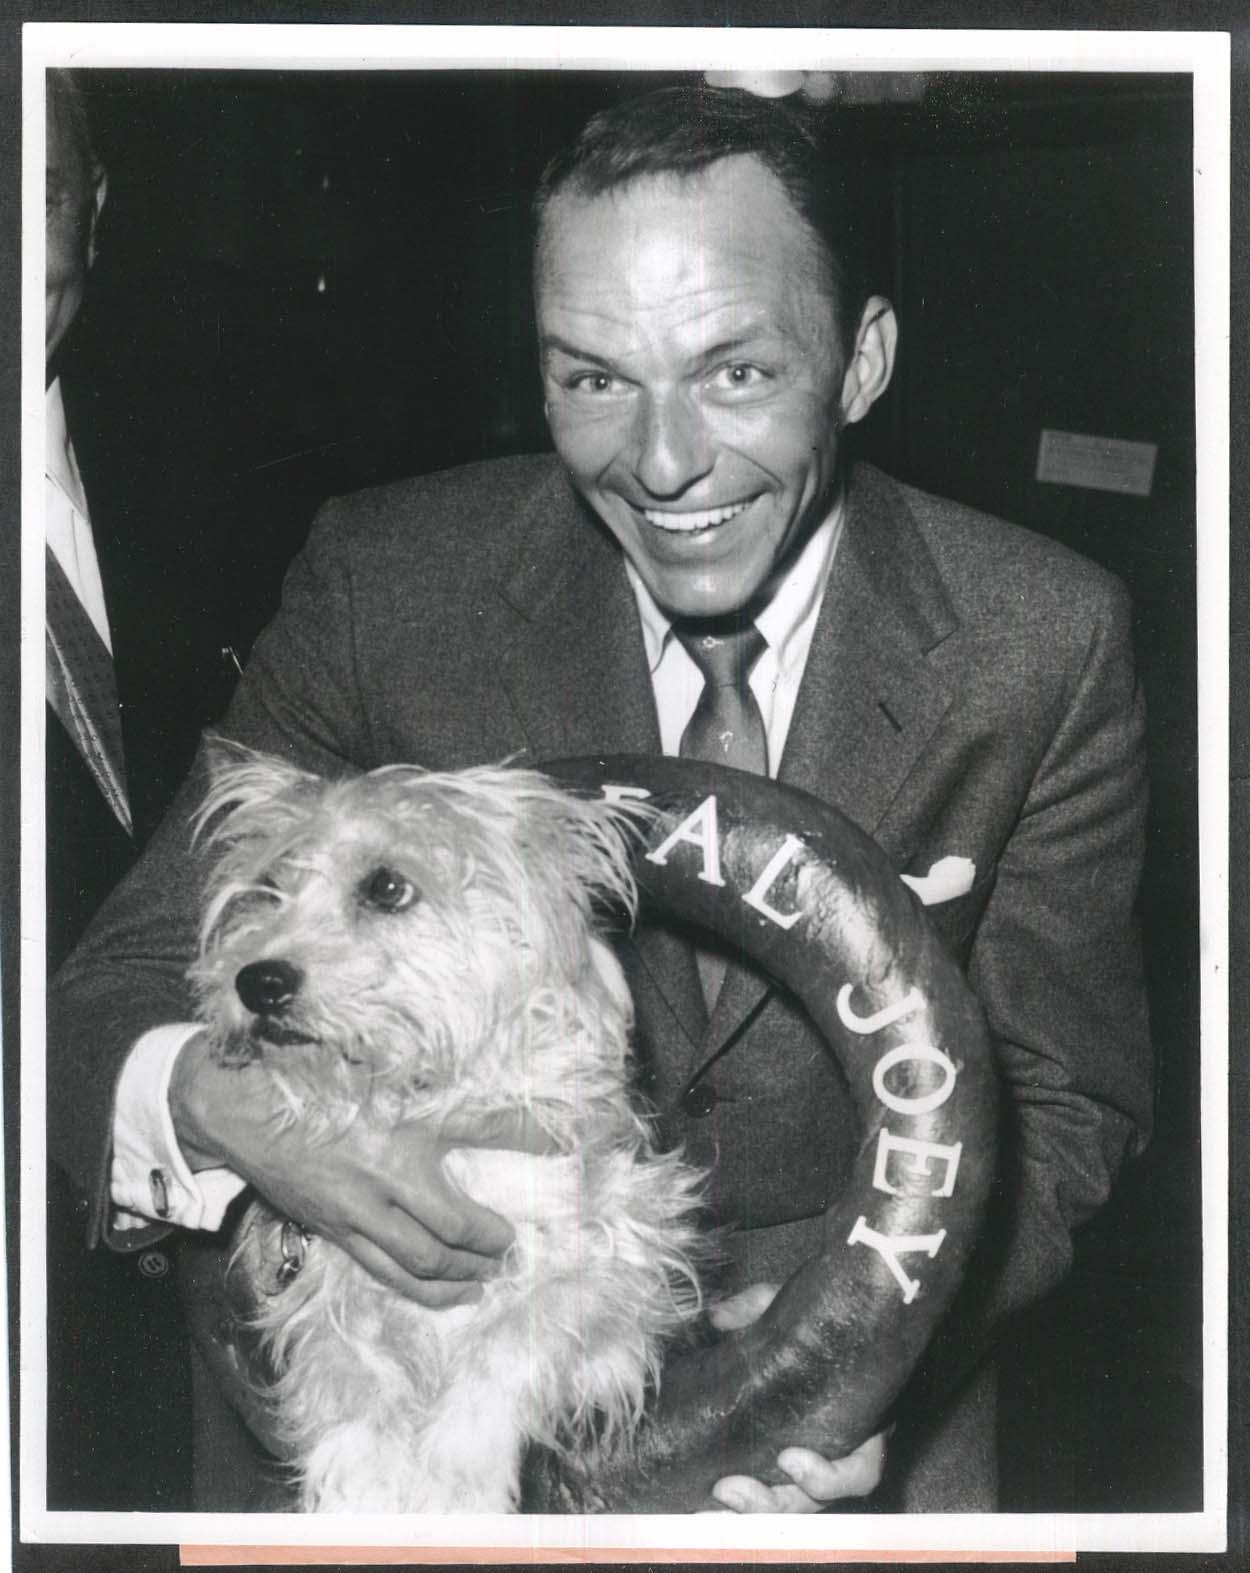 Frank Sinatra Pal Joey 8x10 news photograph 1970